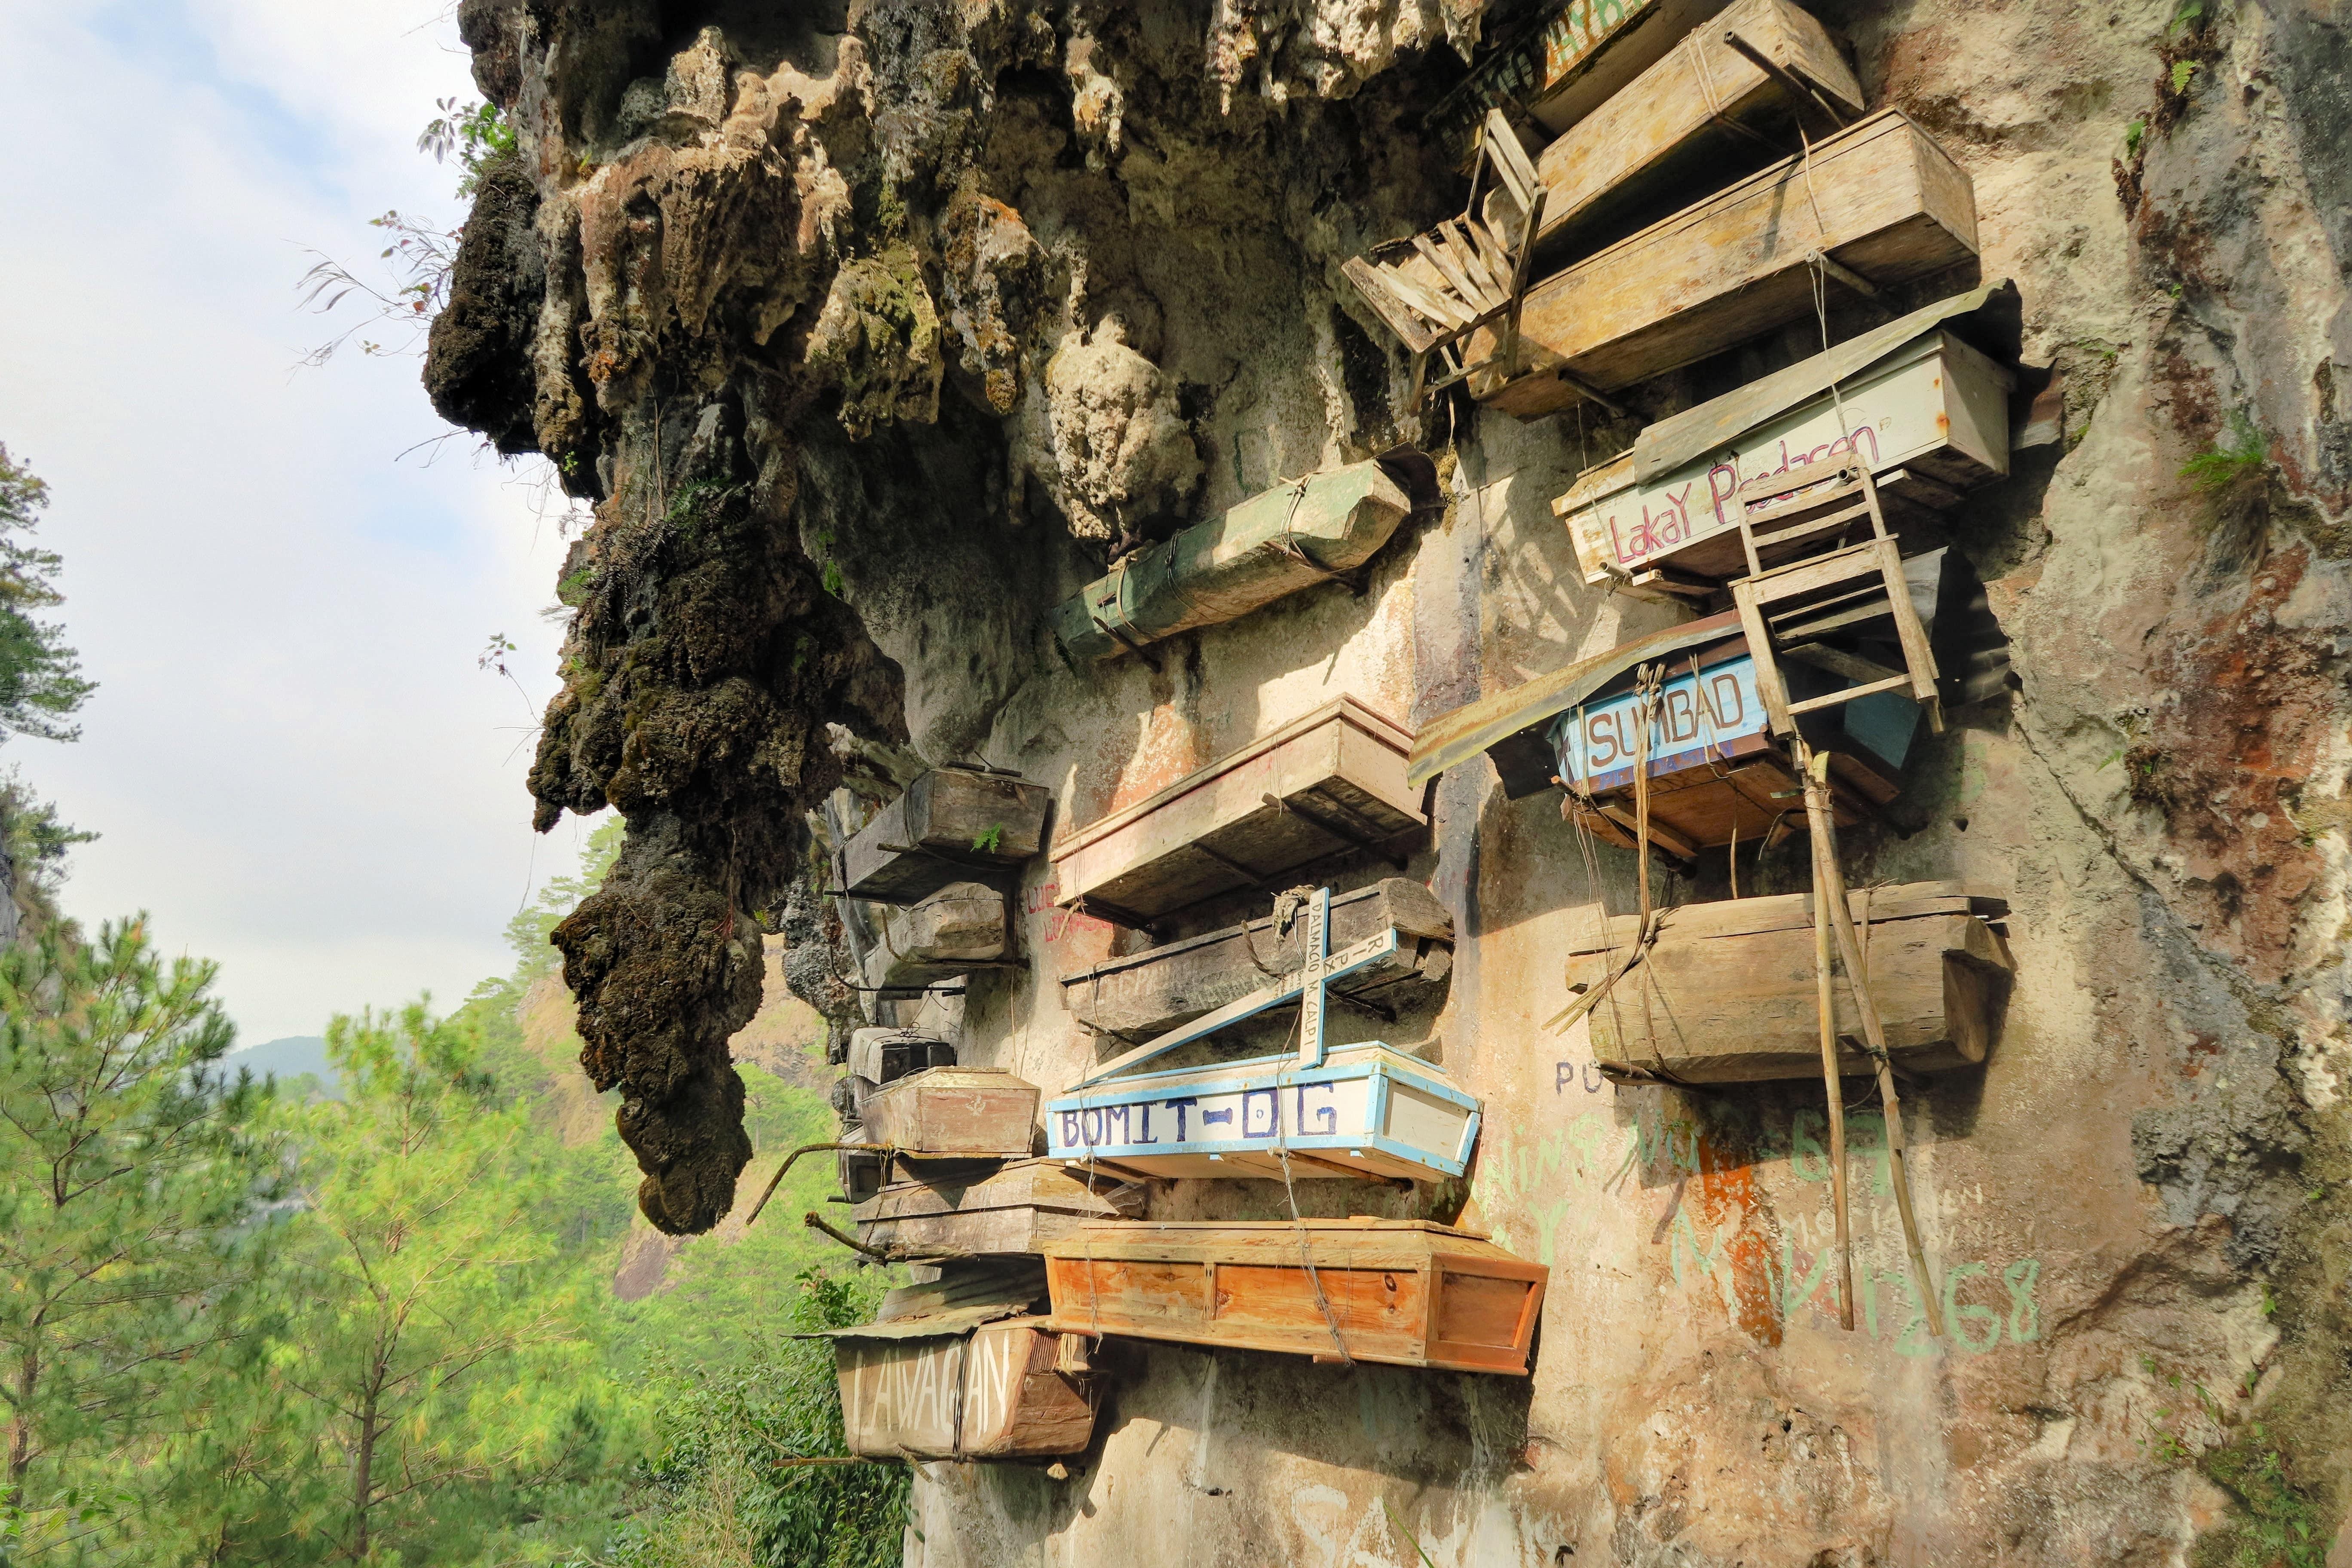 A popular tourist spot called Hanging Coffins in Sagada